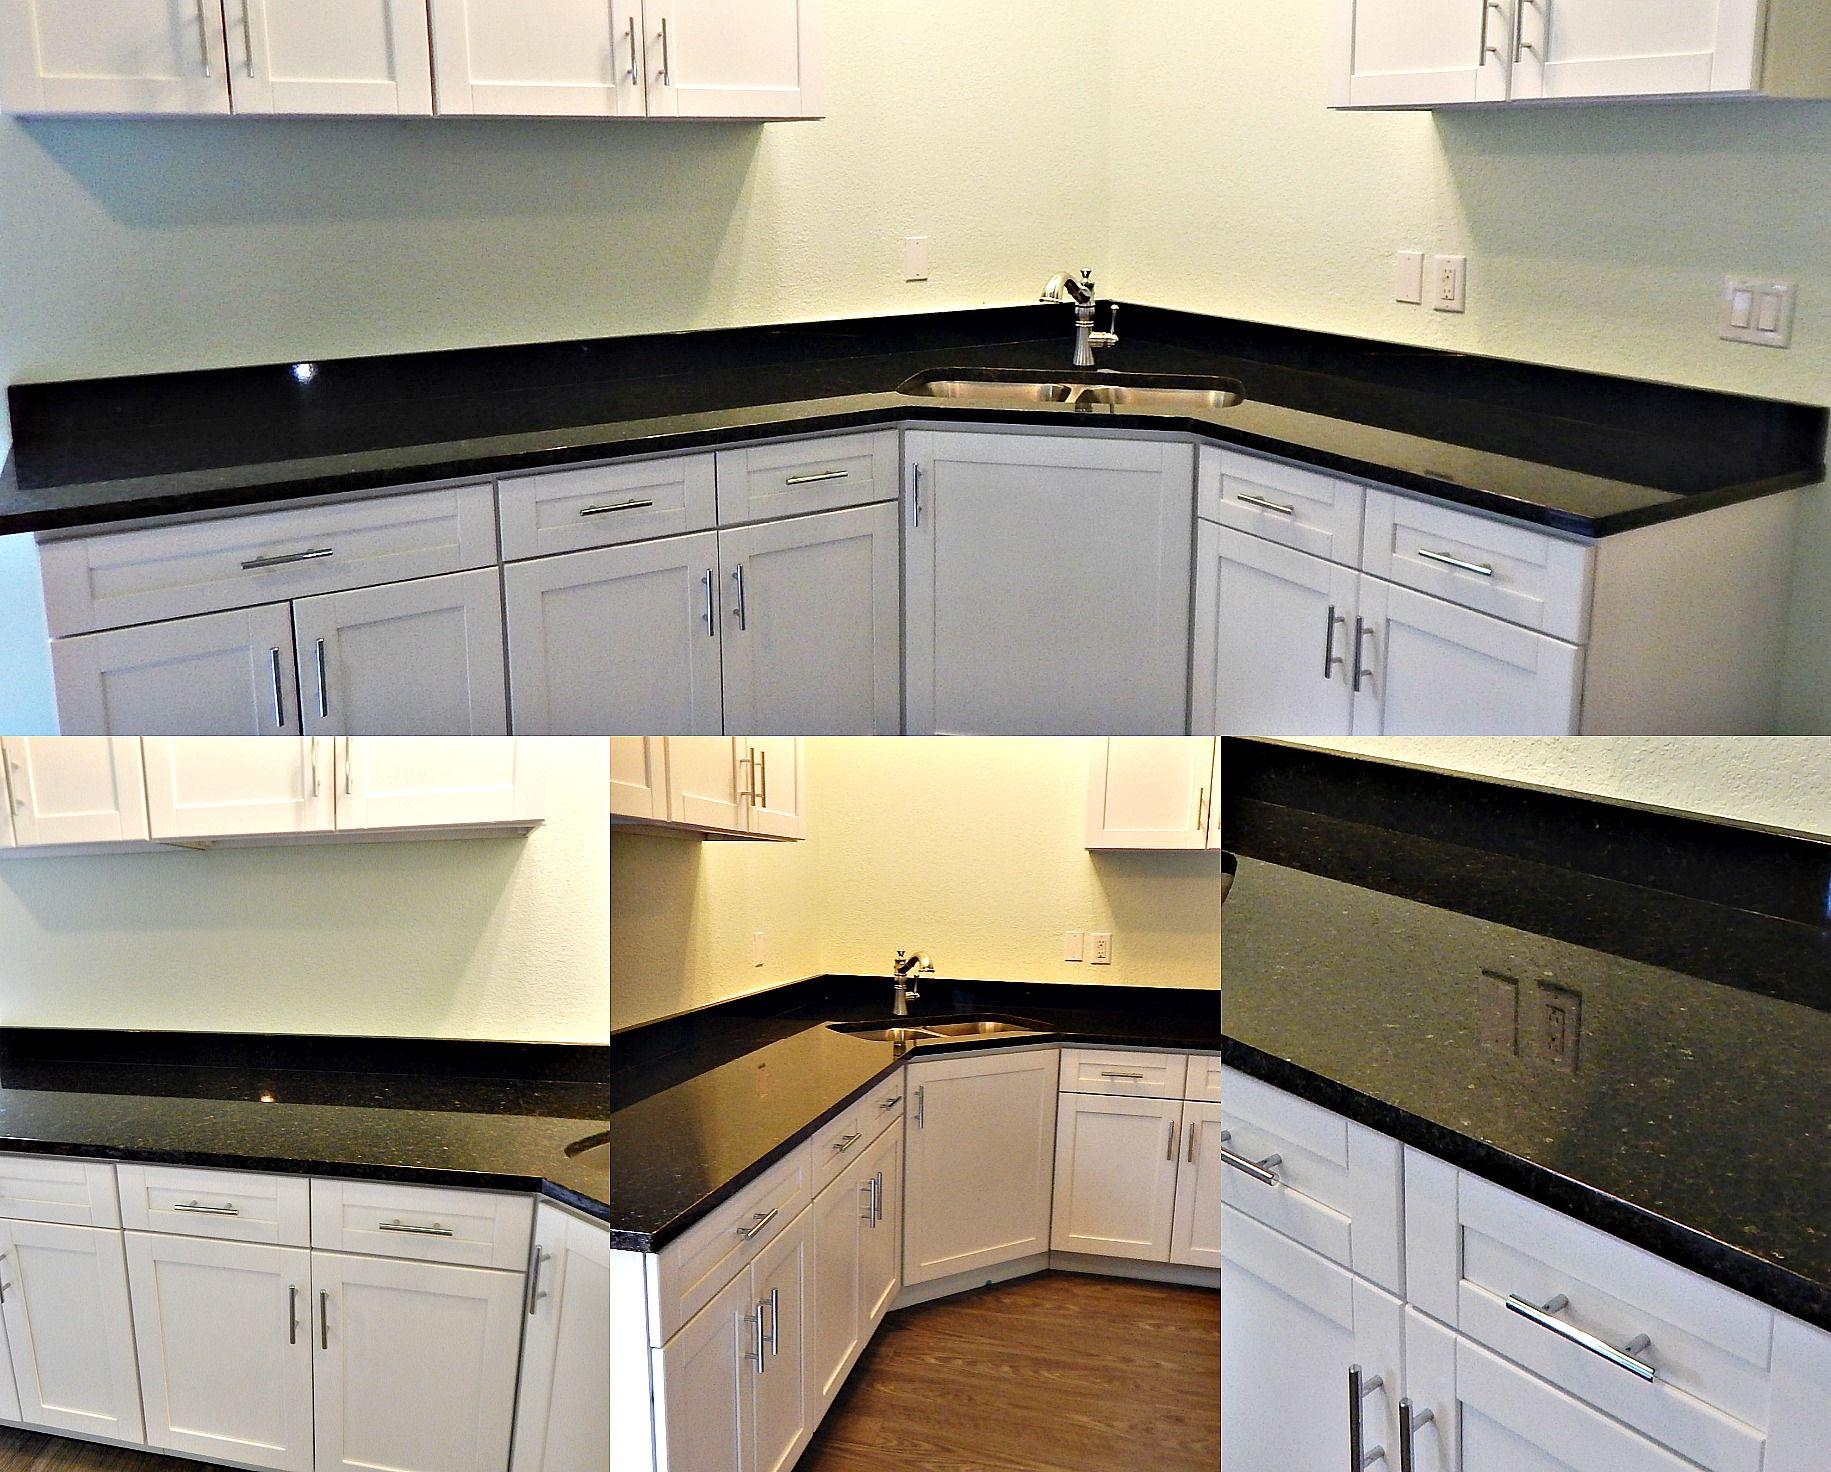 Countertop Remodel With Verde Ubatuba Granite, Flat Polish Edge And Stainless  Steel Sink.